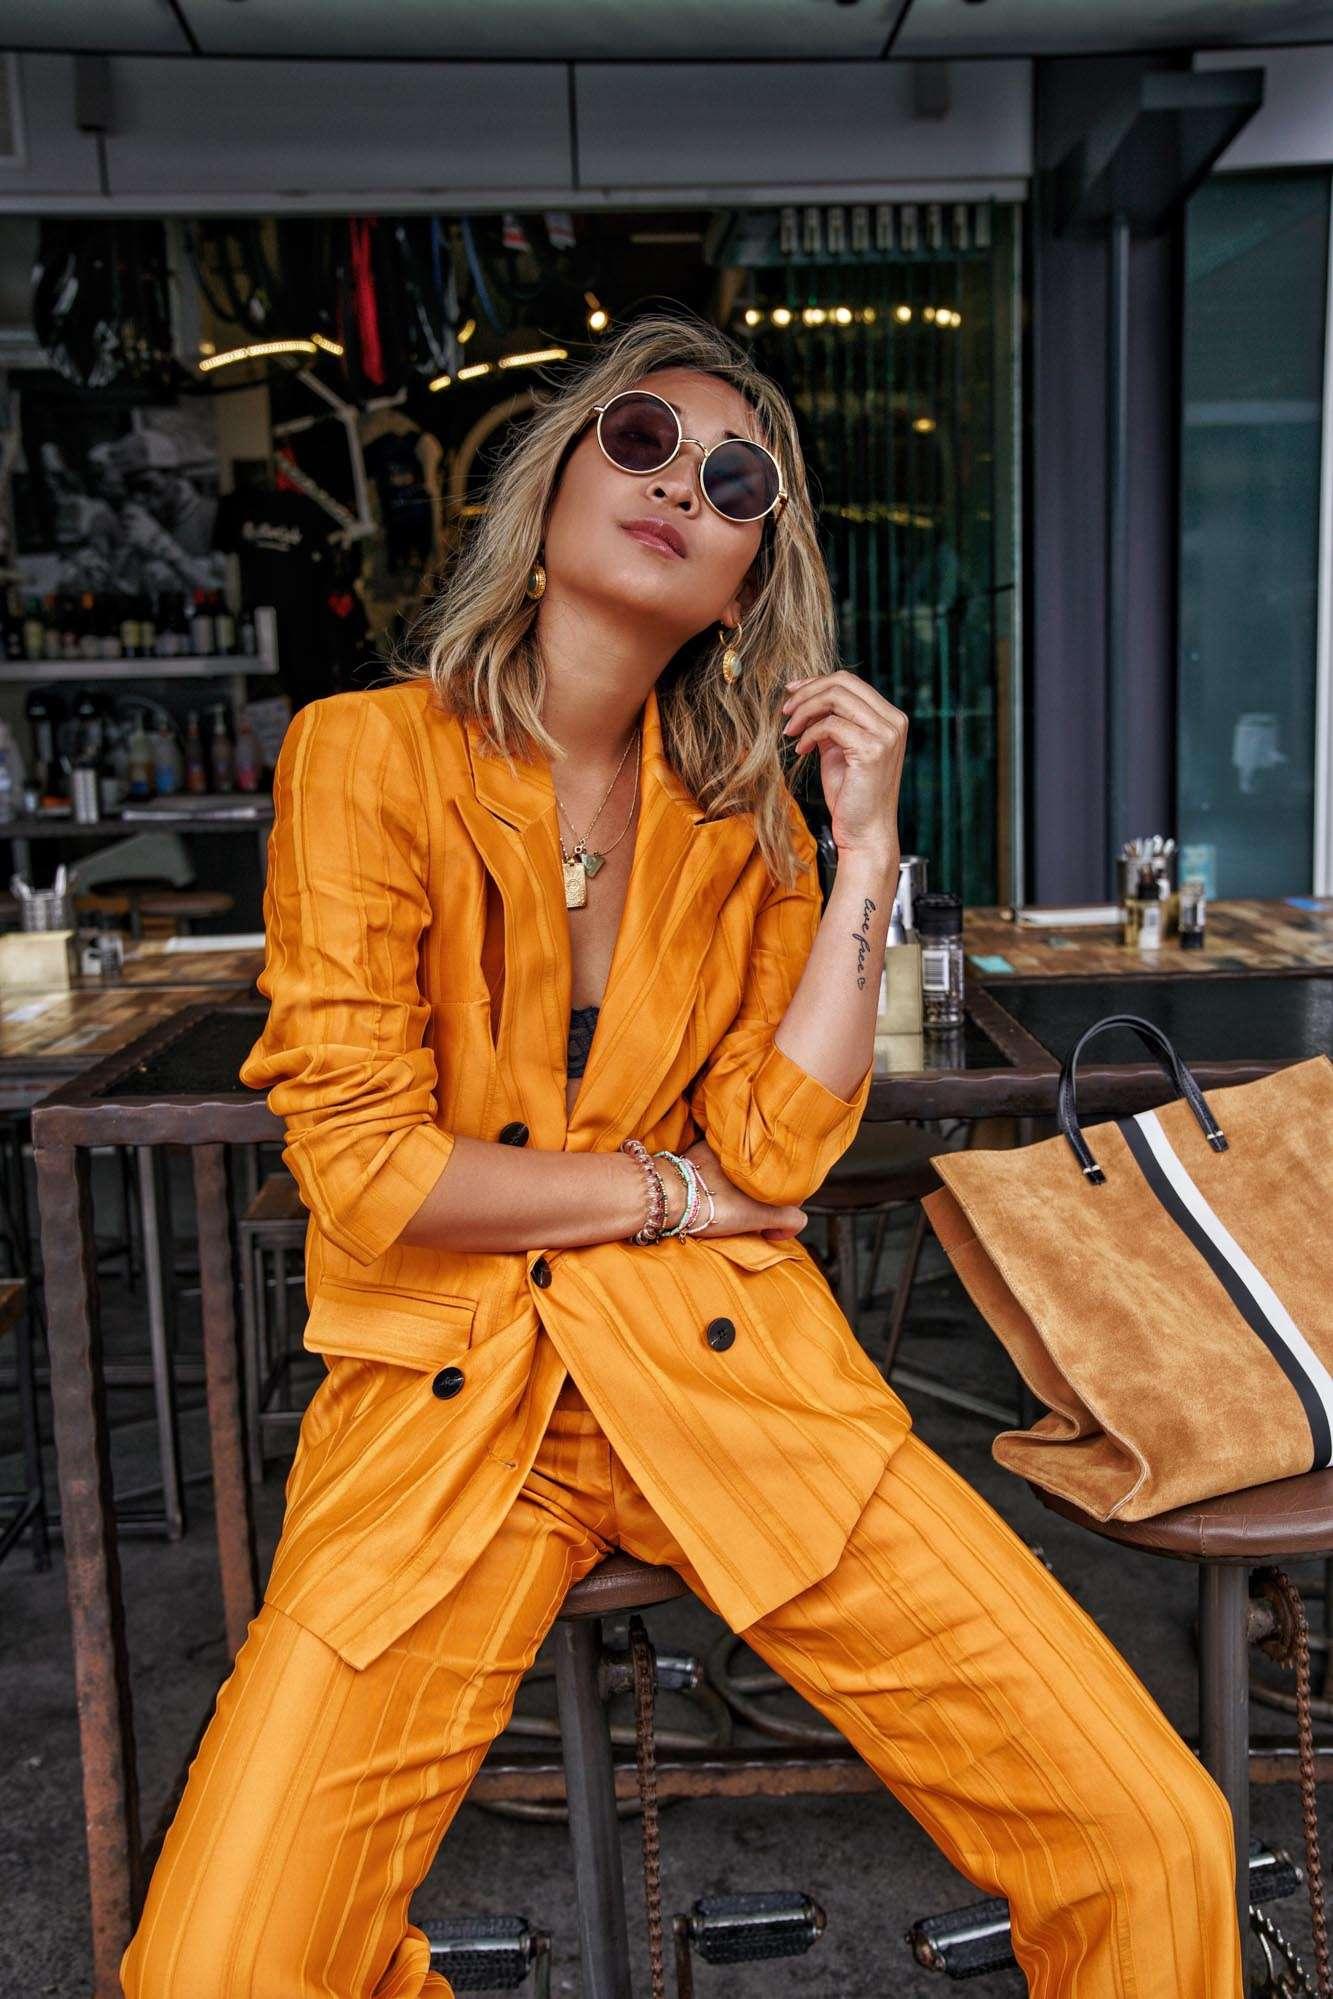 The Iconic, Topshop Orange Suit